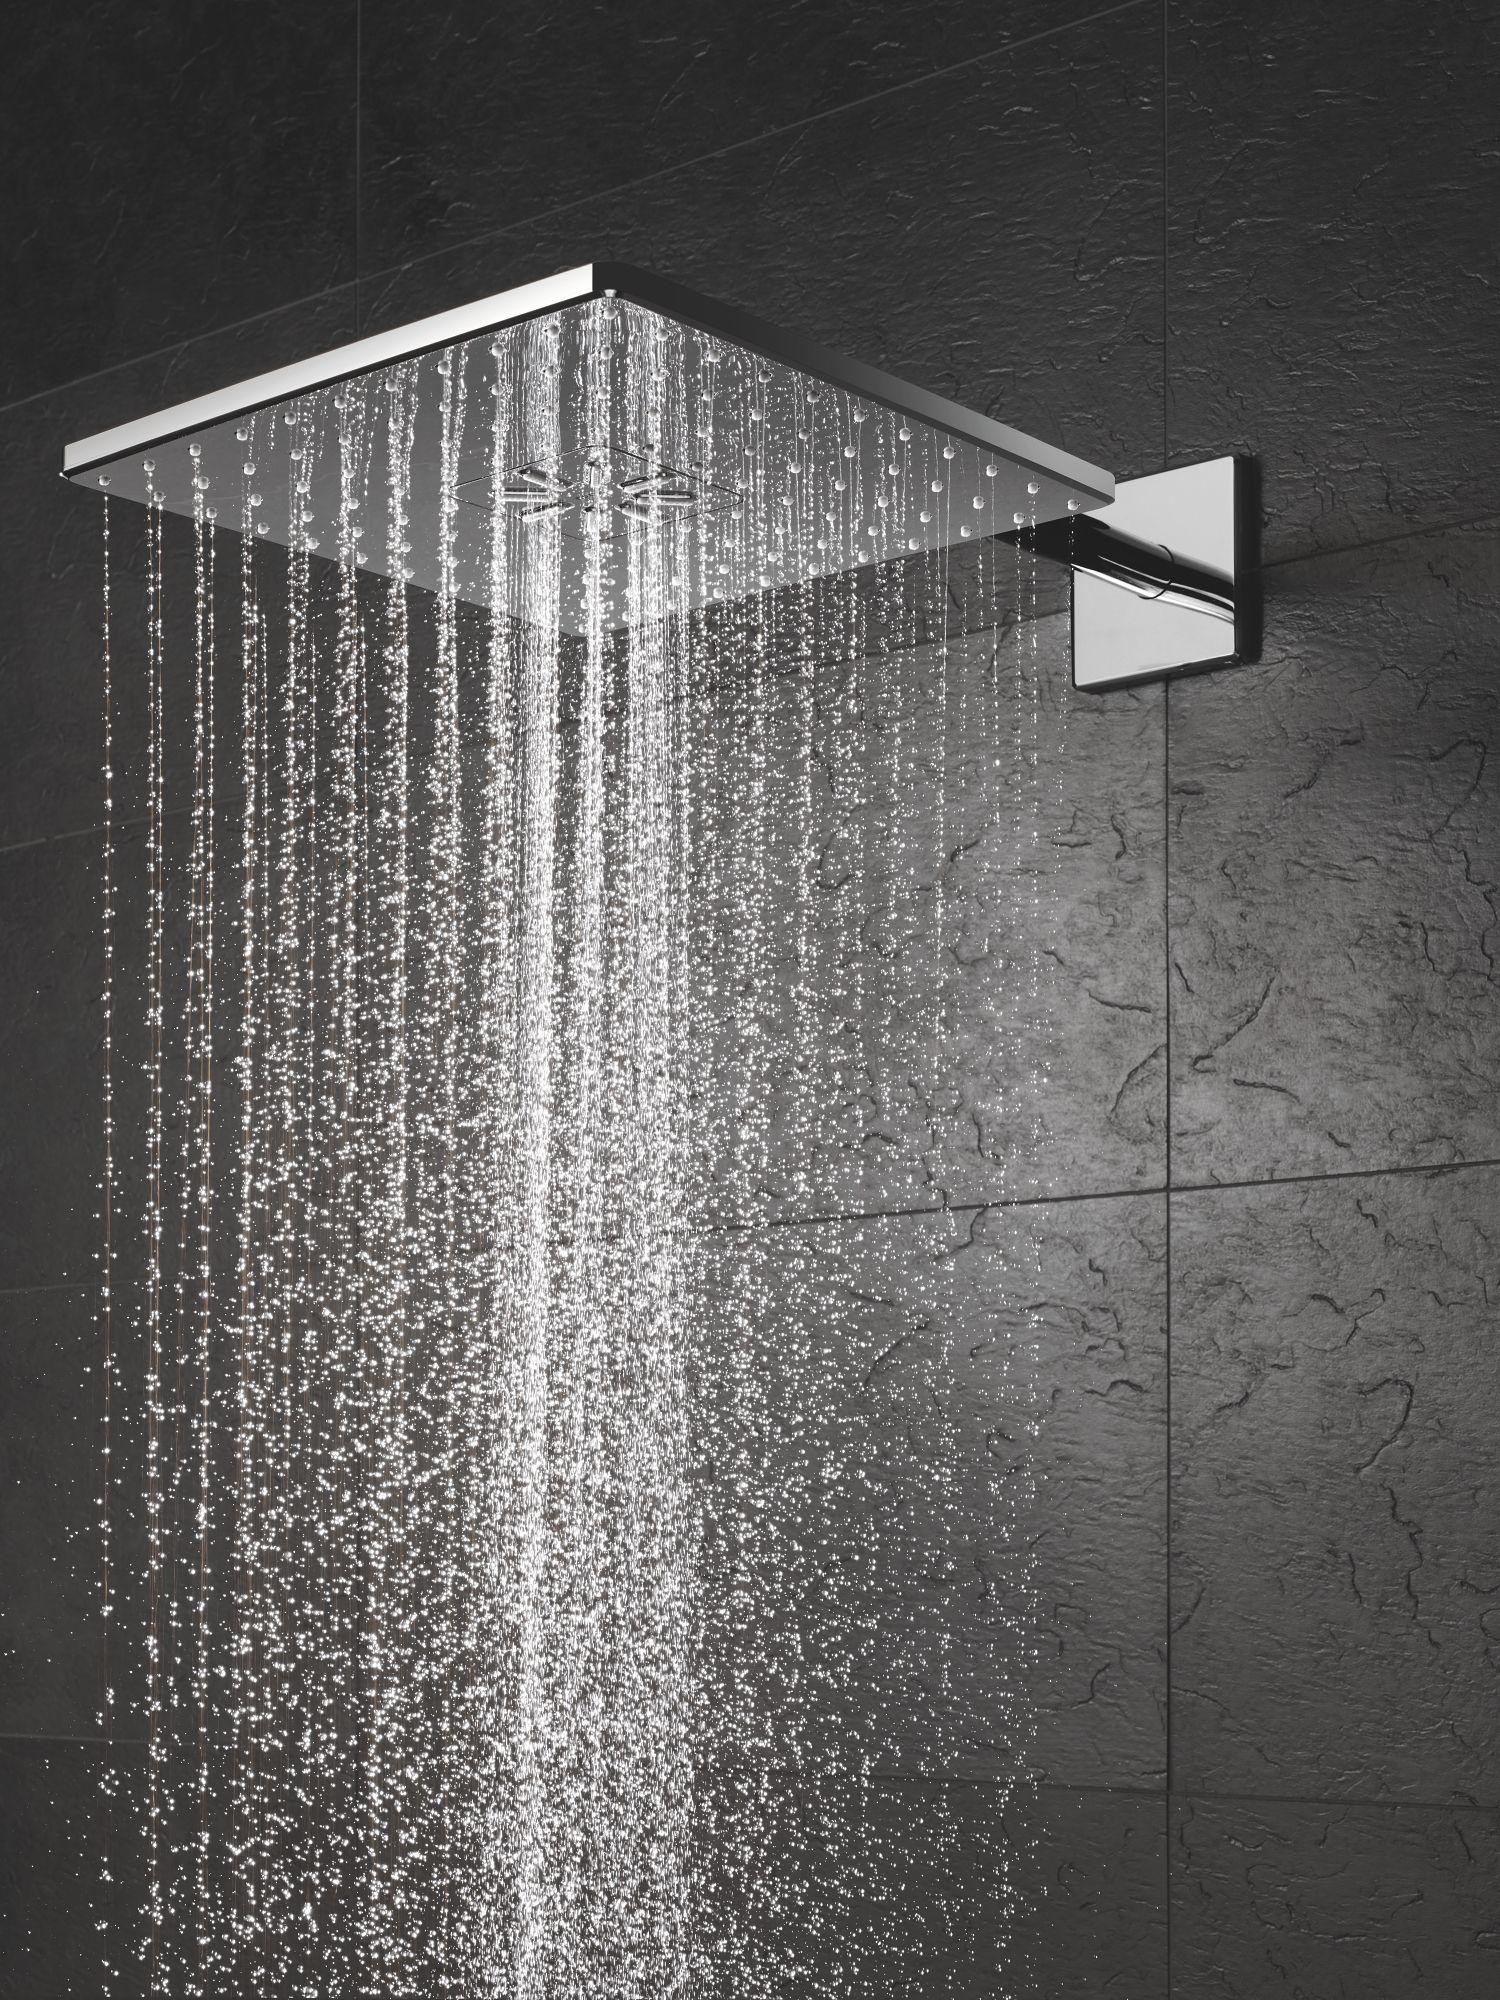 Rainshower Head Showers Shower Sets Grohe Shower Wall